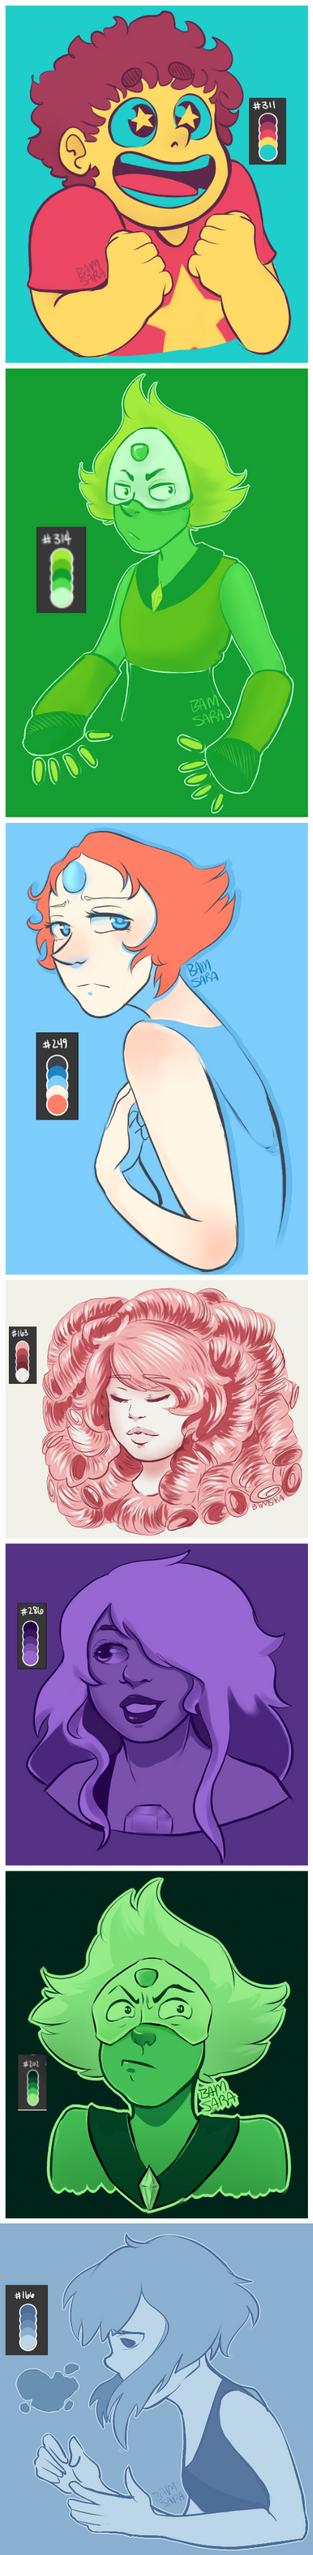 SU Colors by BamSaraKilledYou